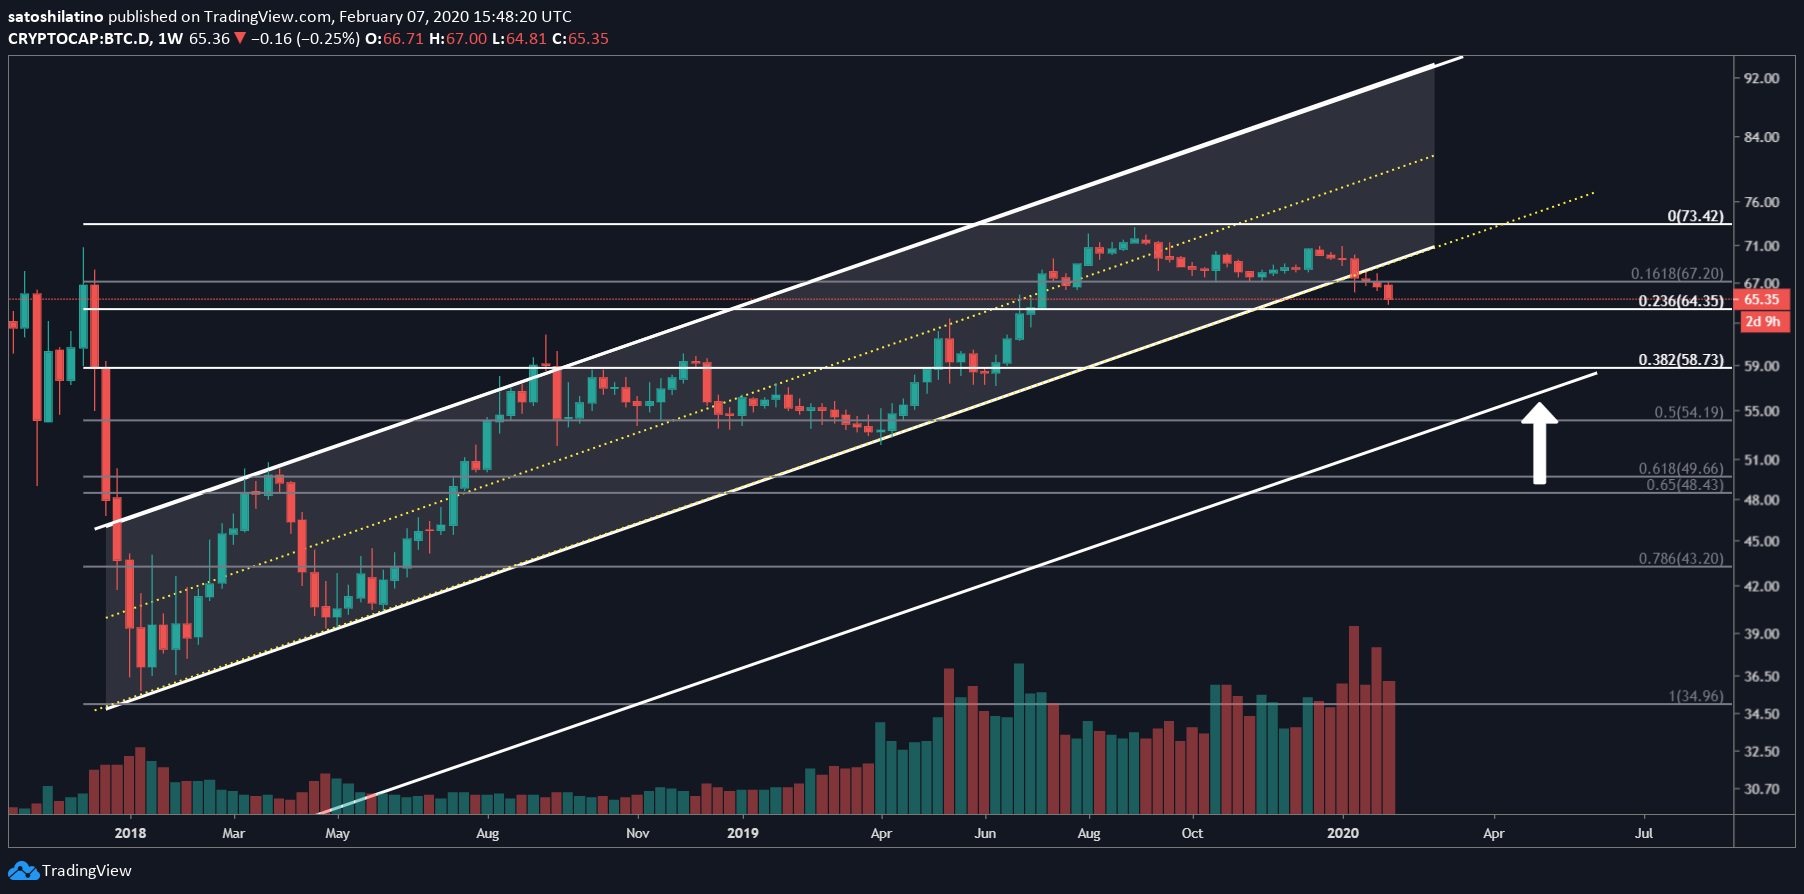 Bitcoin Dominance chart by TradingView